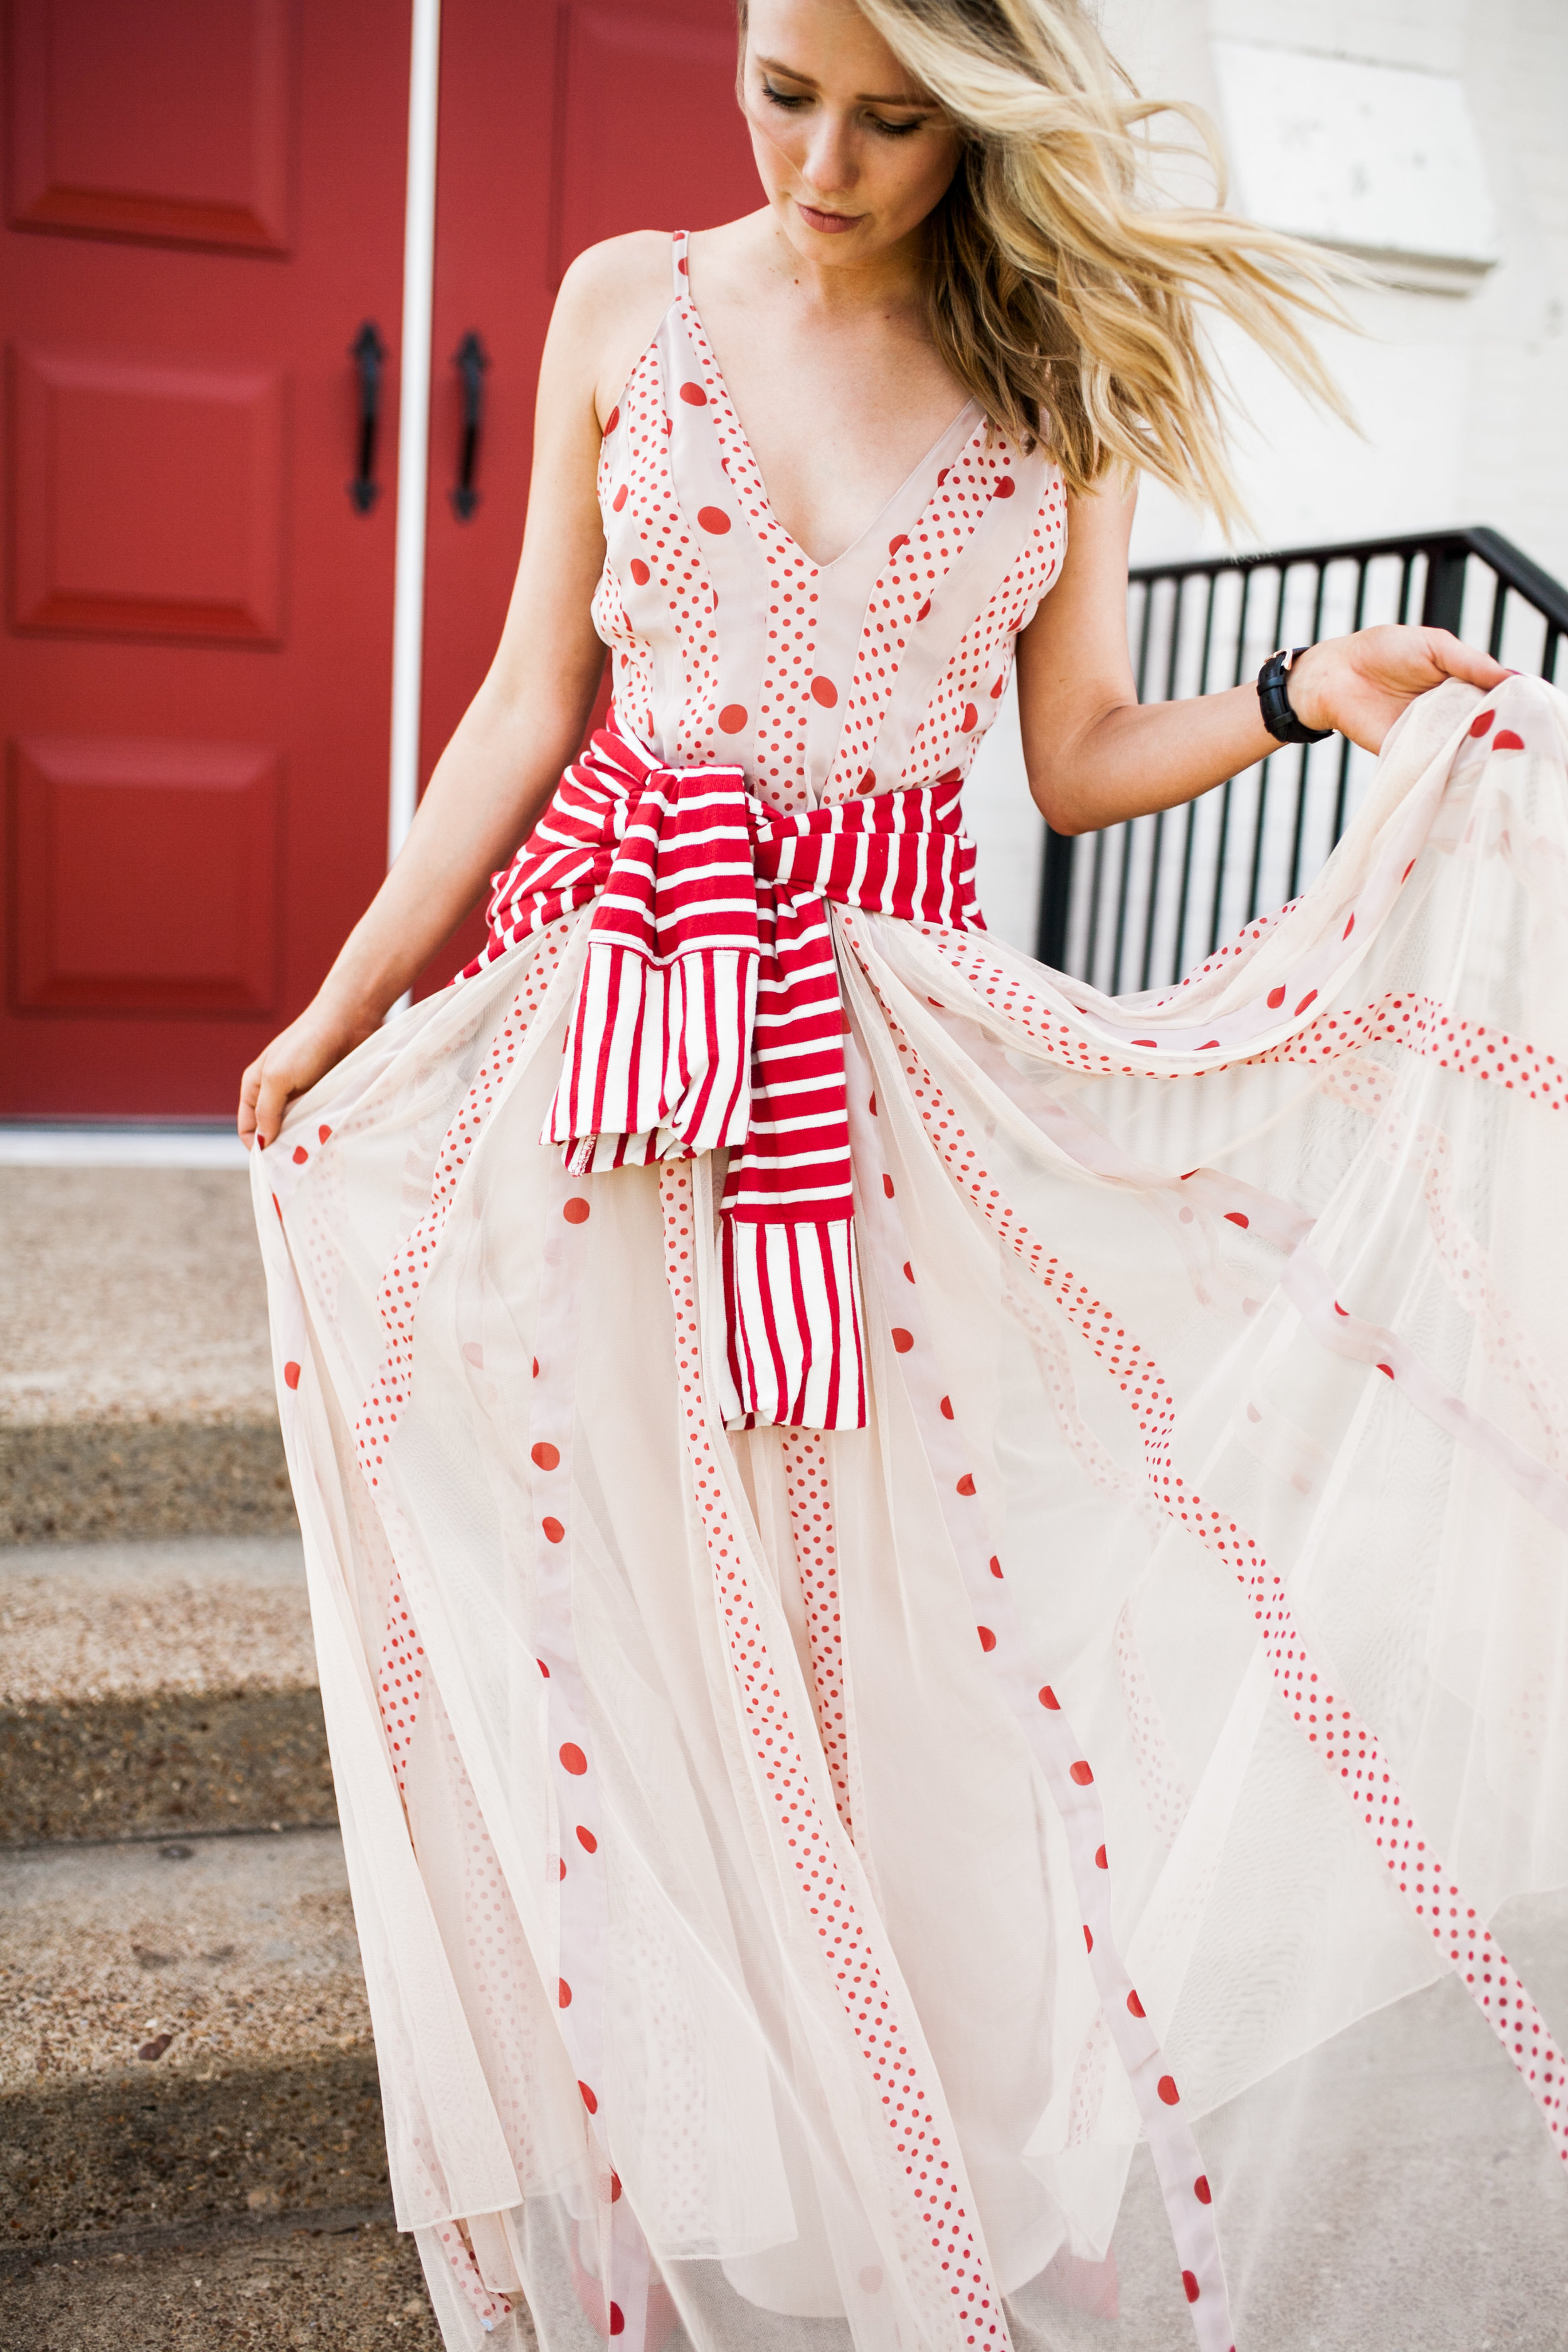 dresses-for-a-summer-wedding.jpg